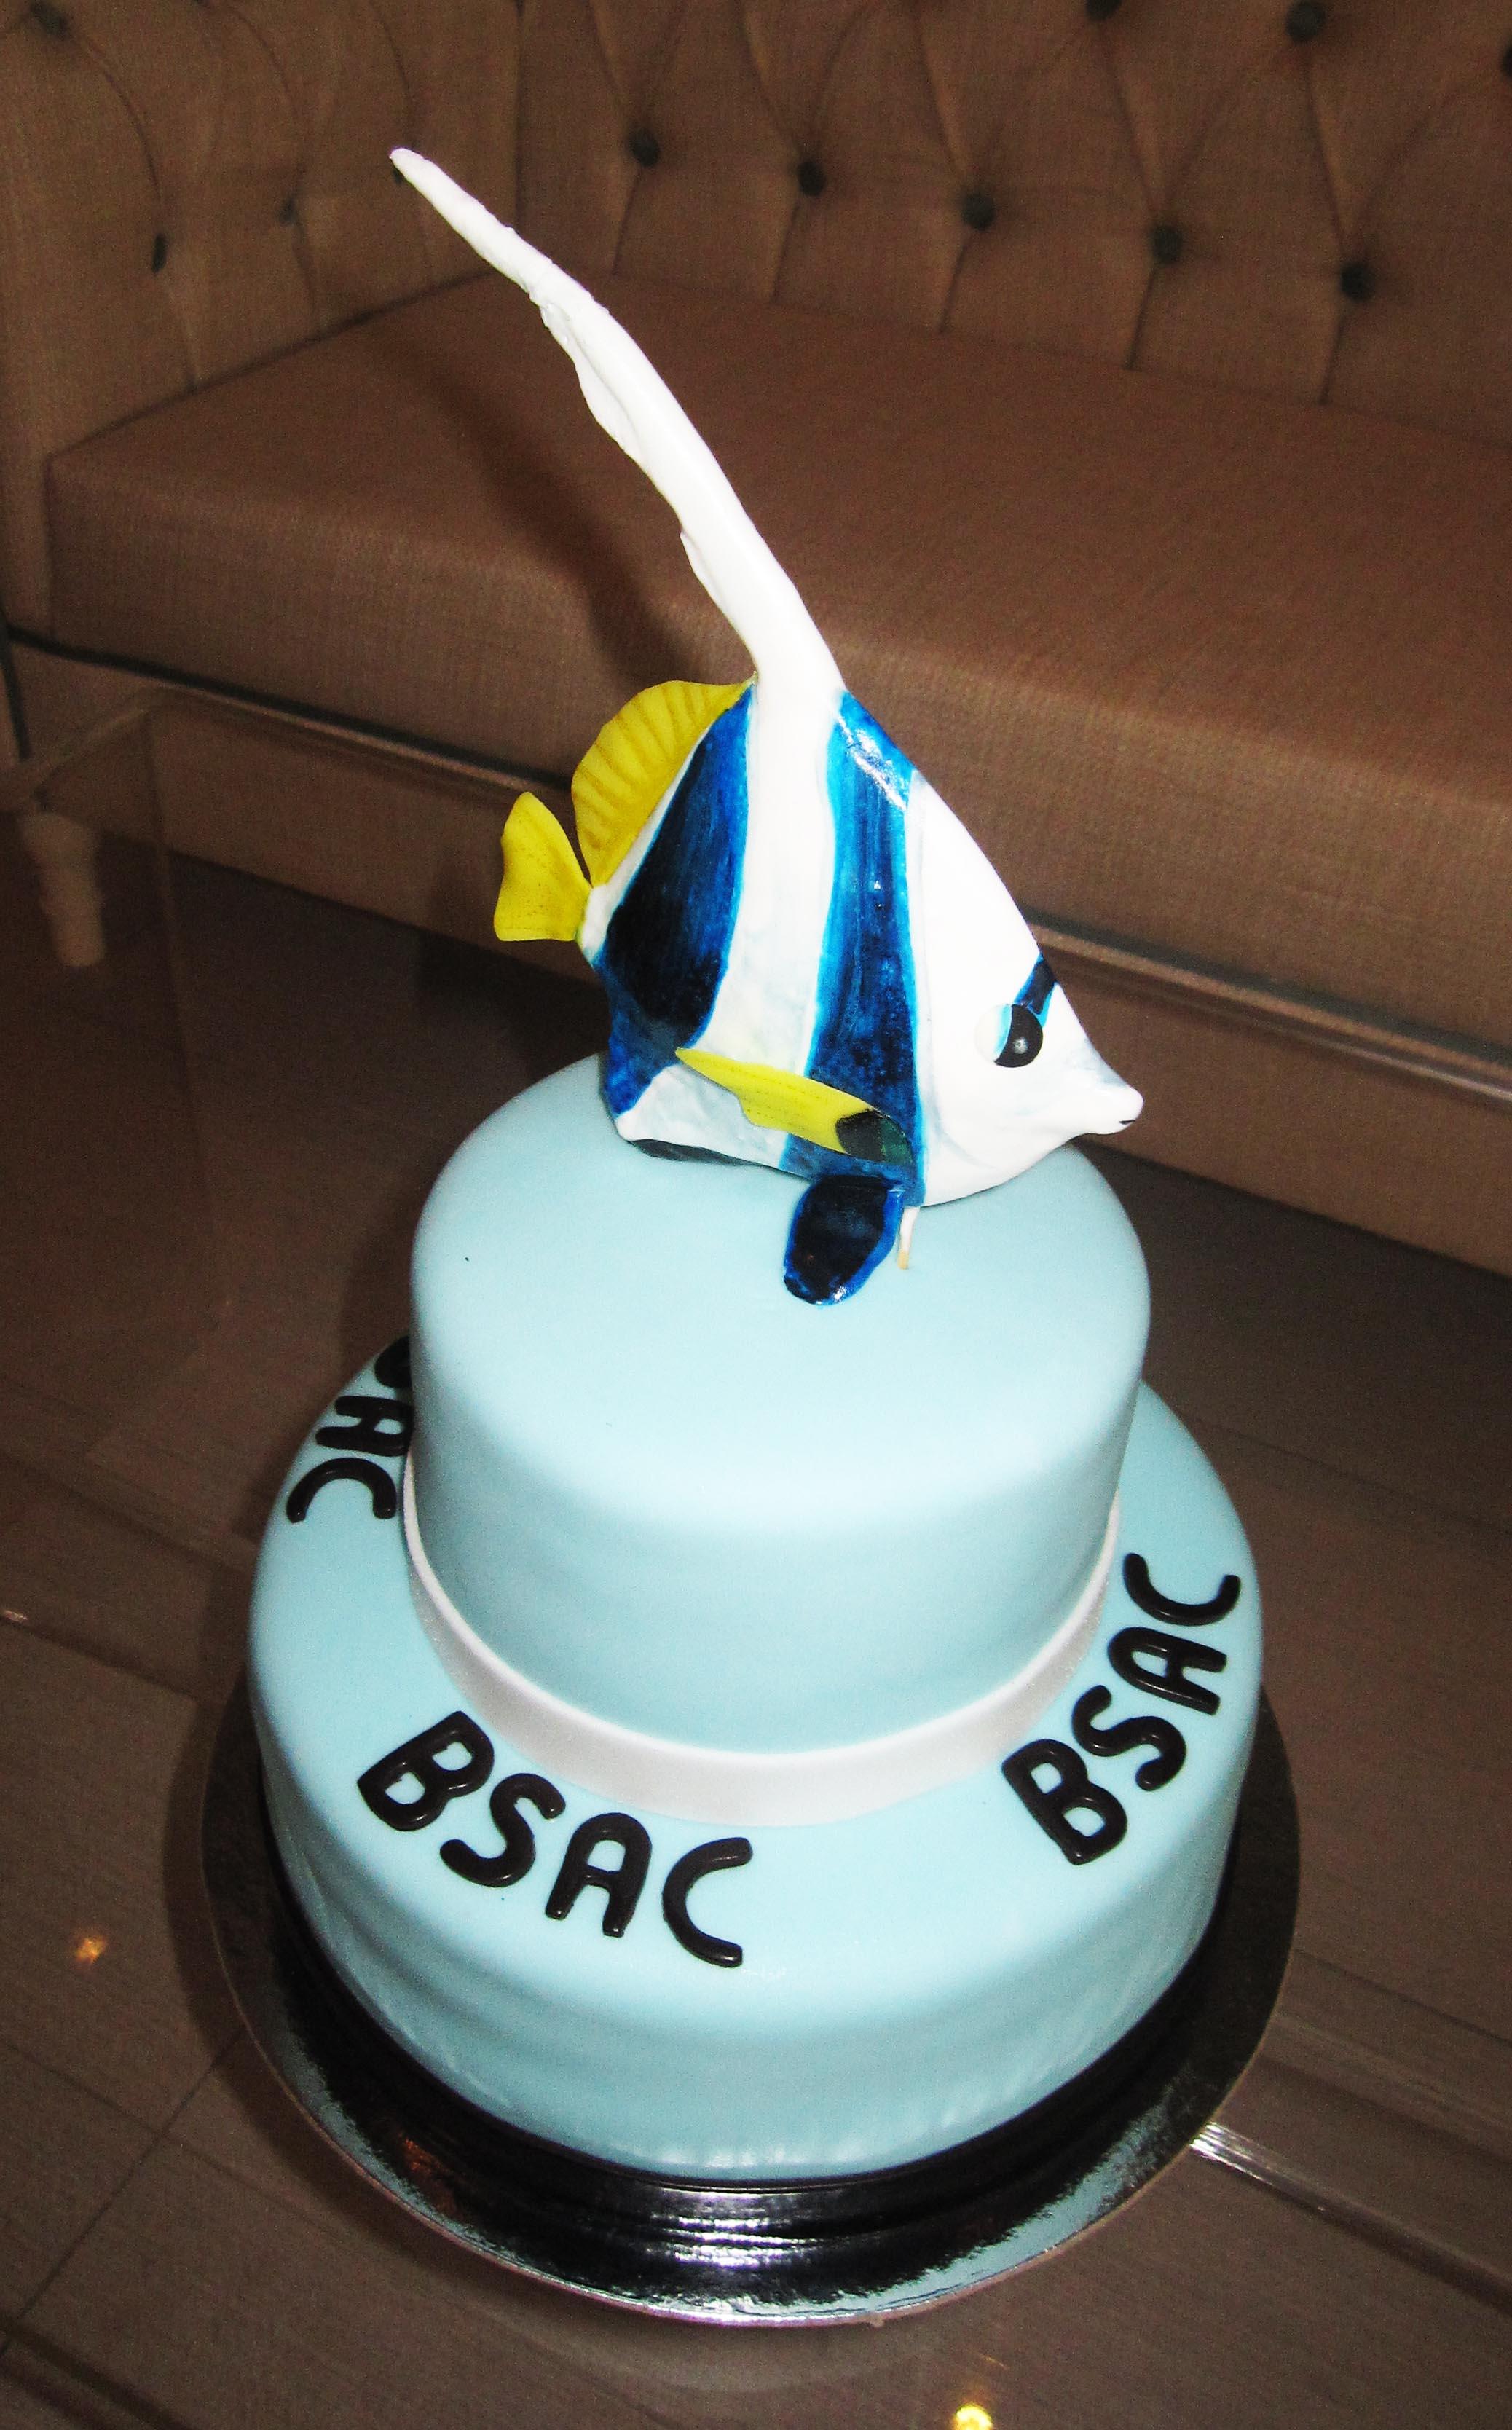 Cake of the Day The November Company